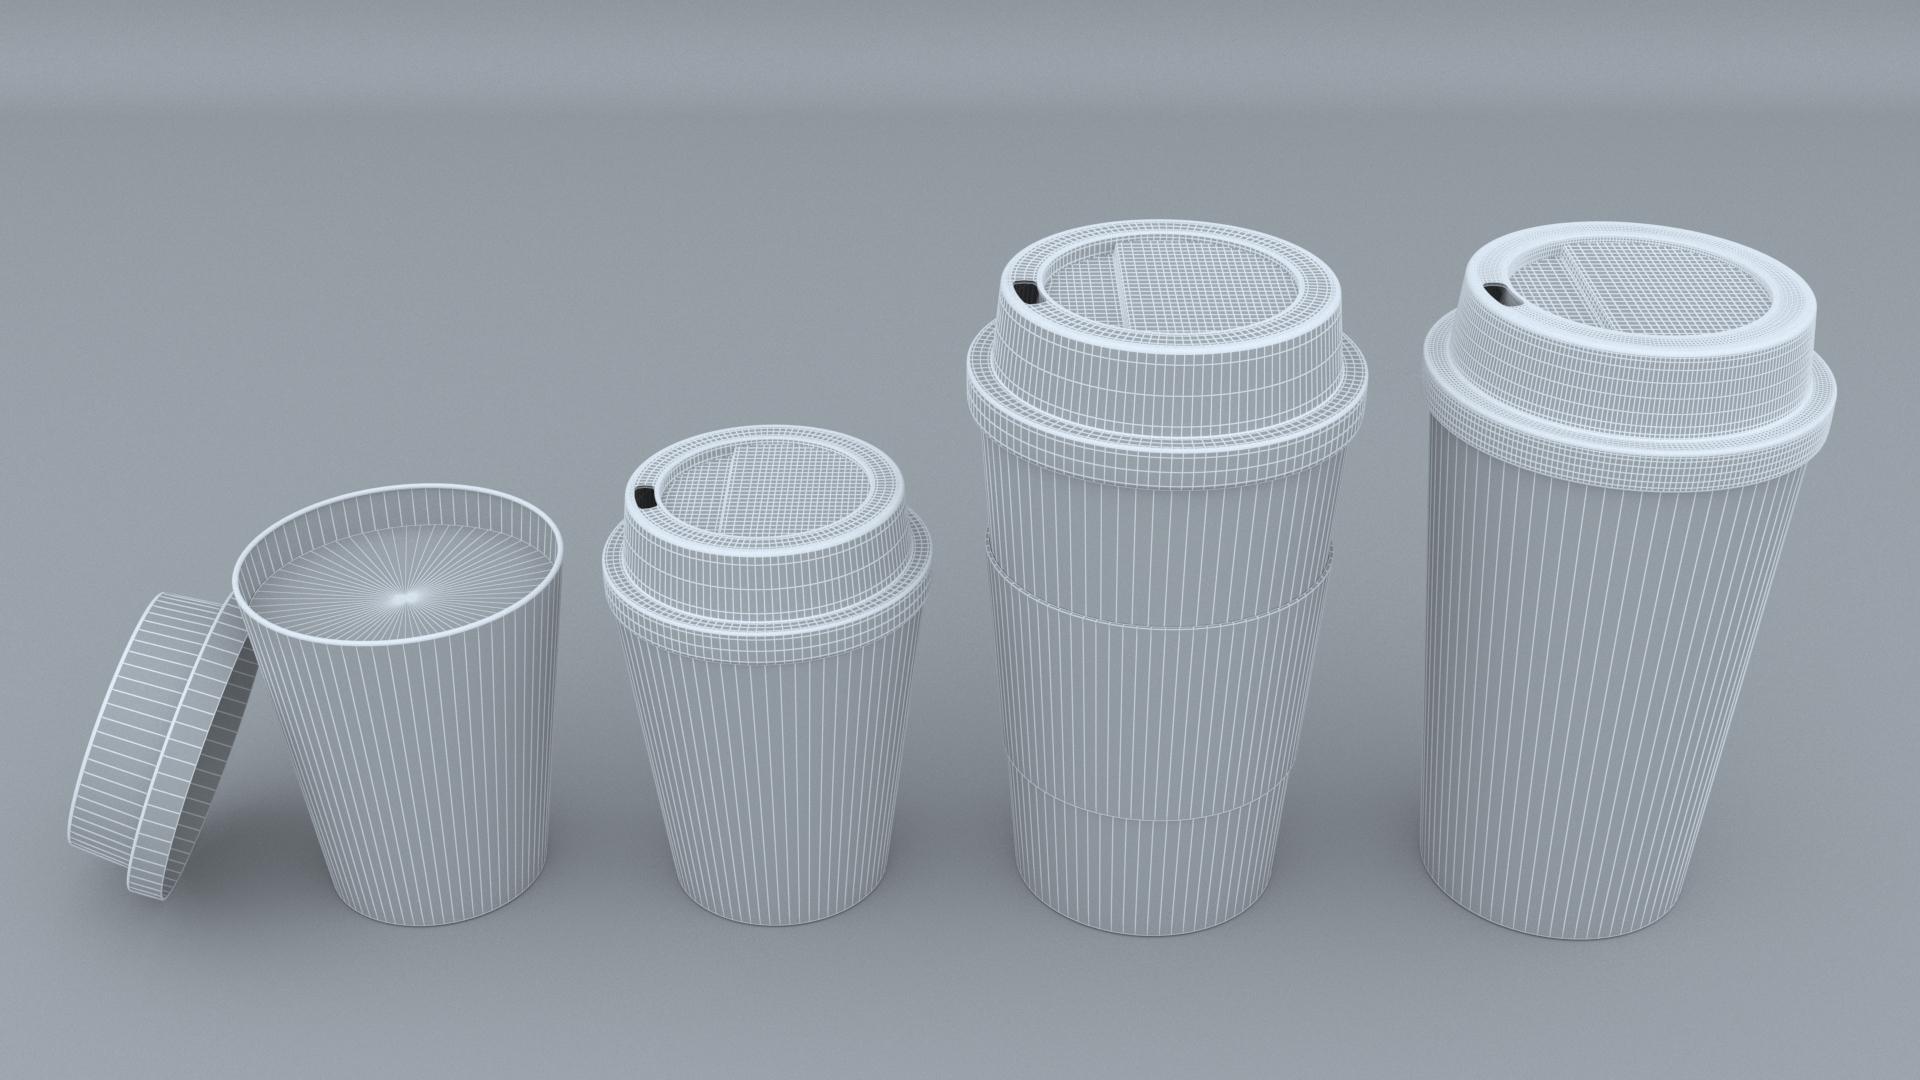 8.jpg Download STL file Coffee Cup • 3D printing template, illusioncreators1979